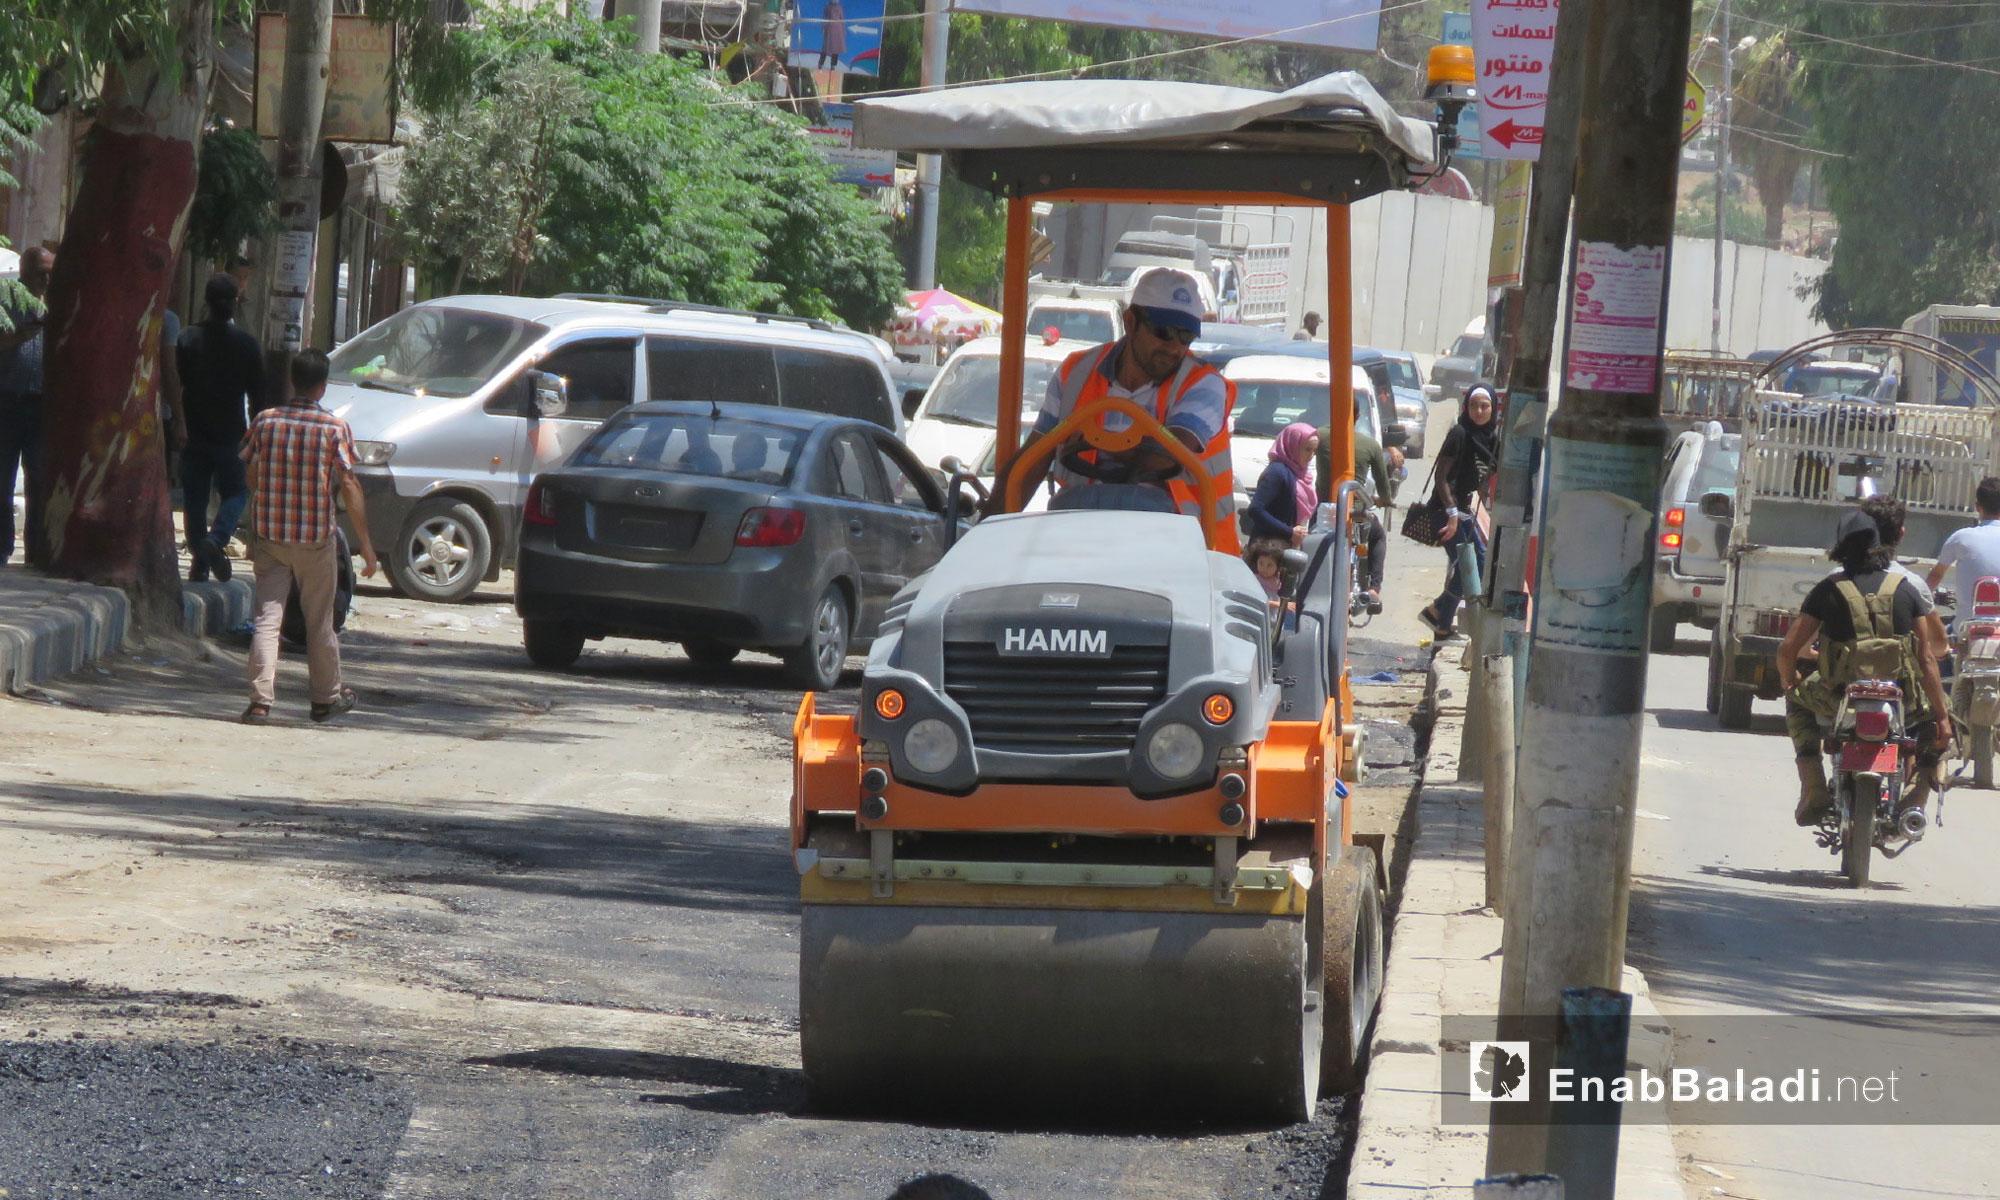 Road rehabilitation process in the city of Afrin – July 9, 2018 (Enab Baladi )